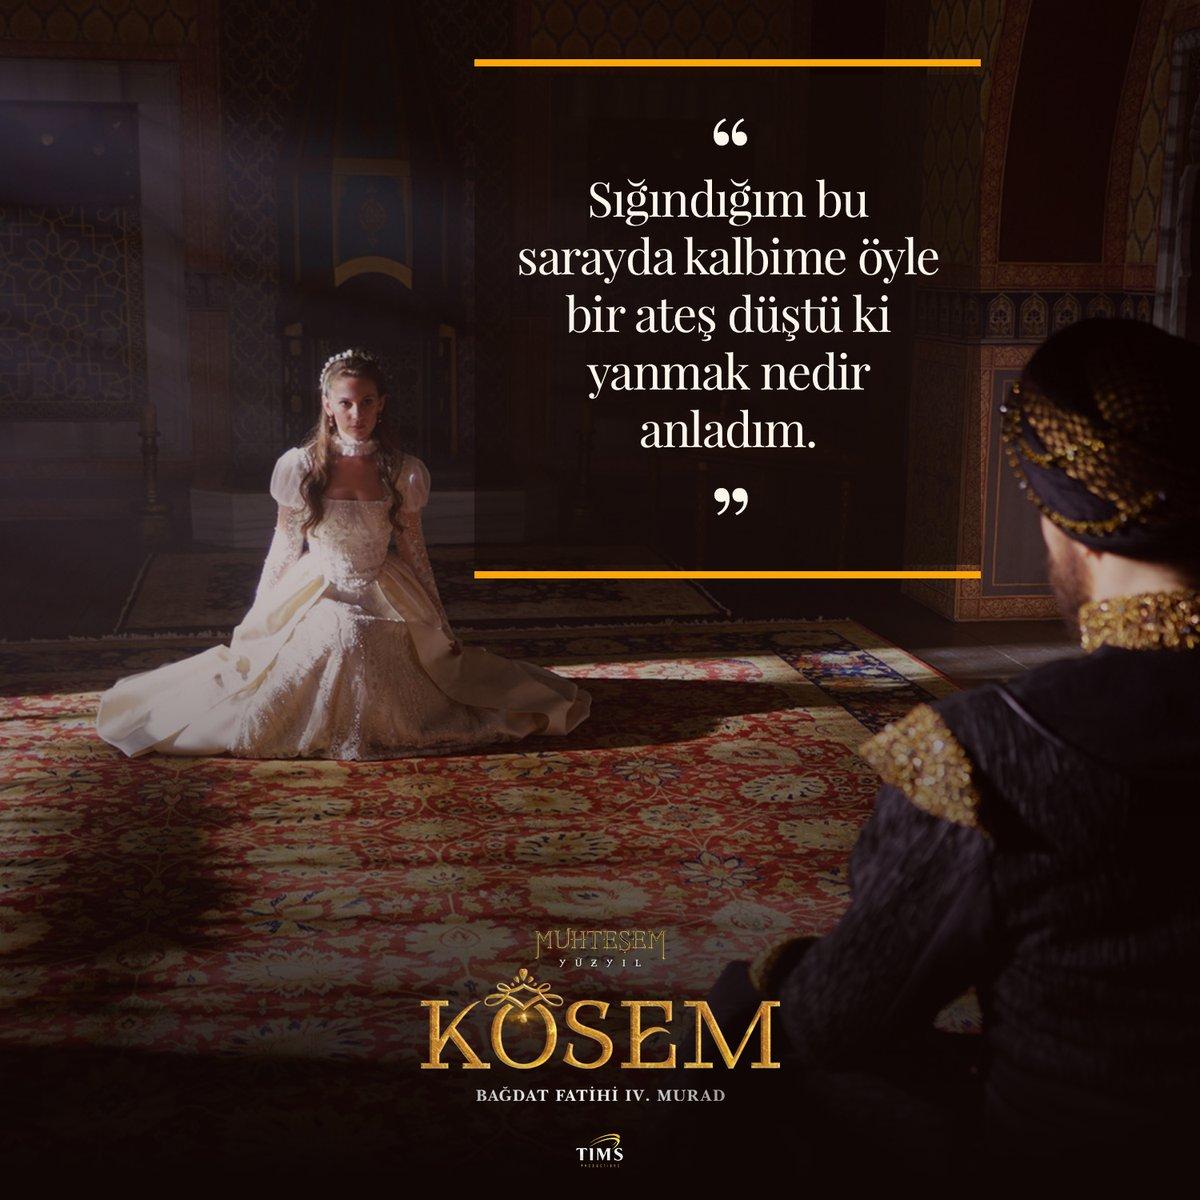 Великолепный век. Кесем - 2 сезон - Muhteşem Yüzyıl Kösem PROMO (3).jpg